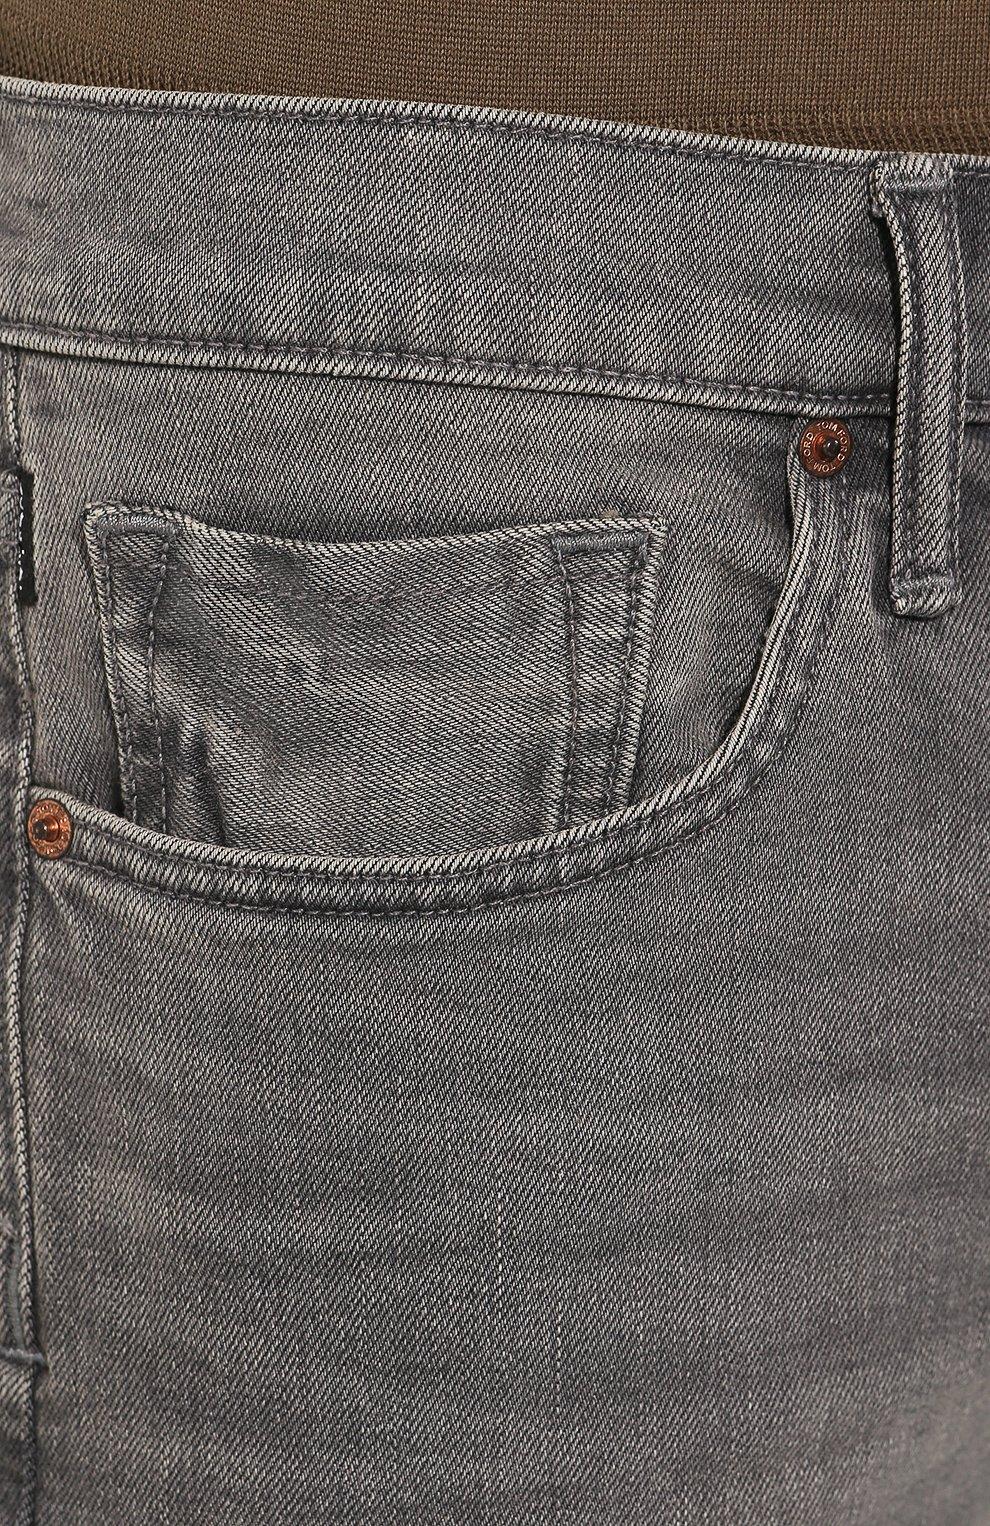 Мужские джинсы прямого кроя TOM FORD серого цвета, арт. BRJ04/TFD002 | Фото 5